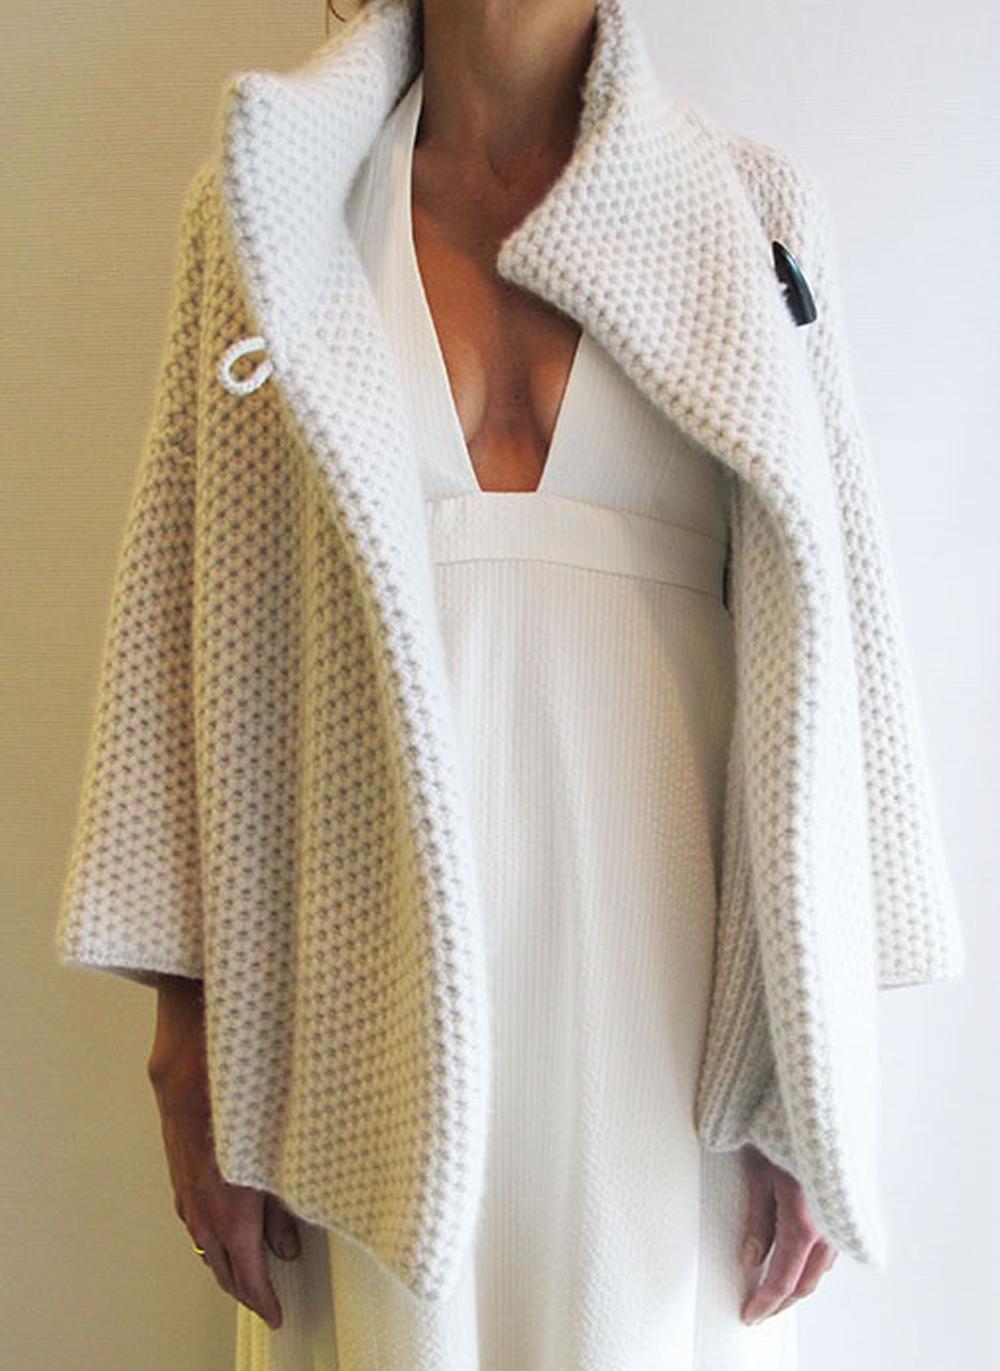 knit-jussara-thewomensroomblog